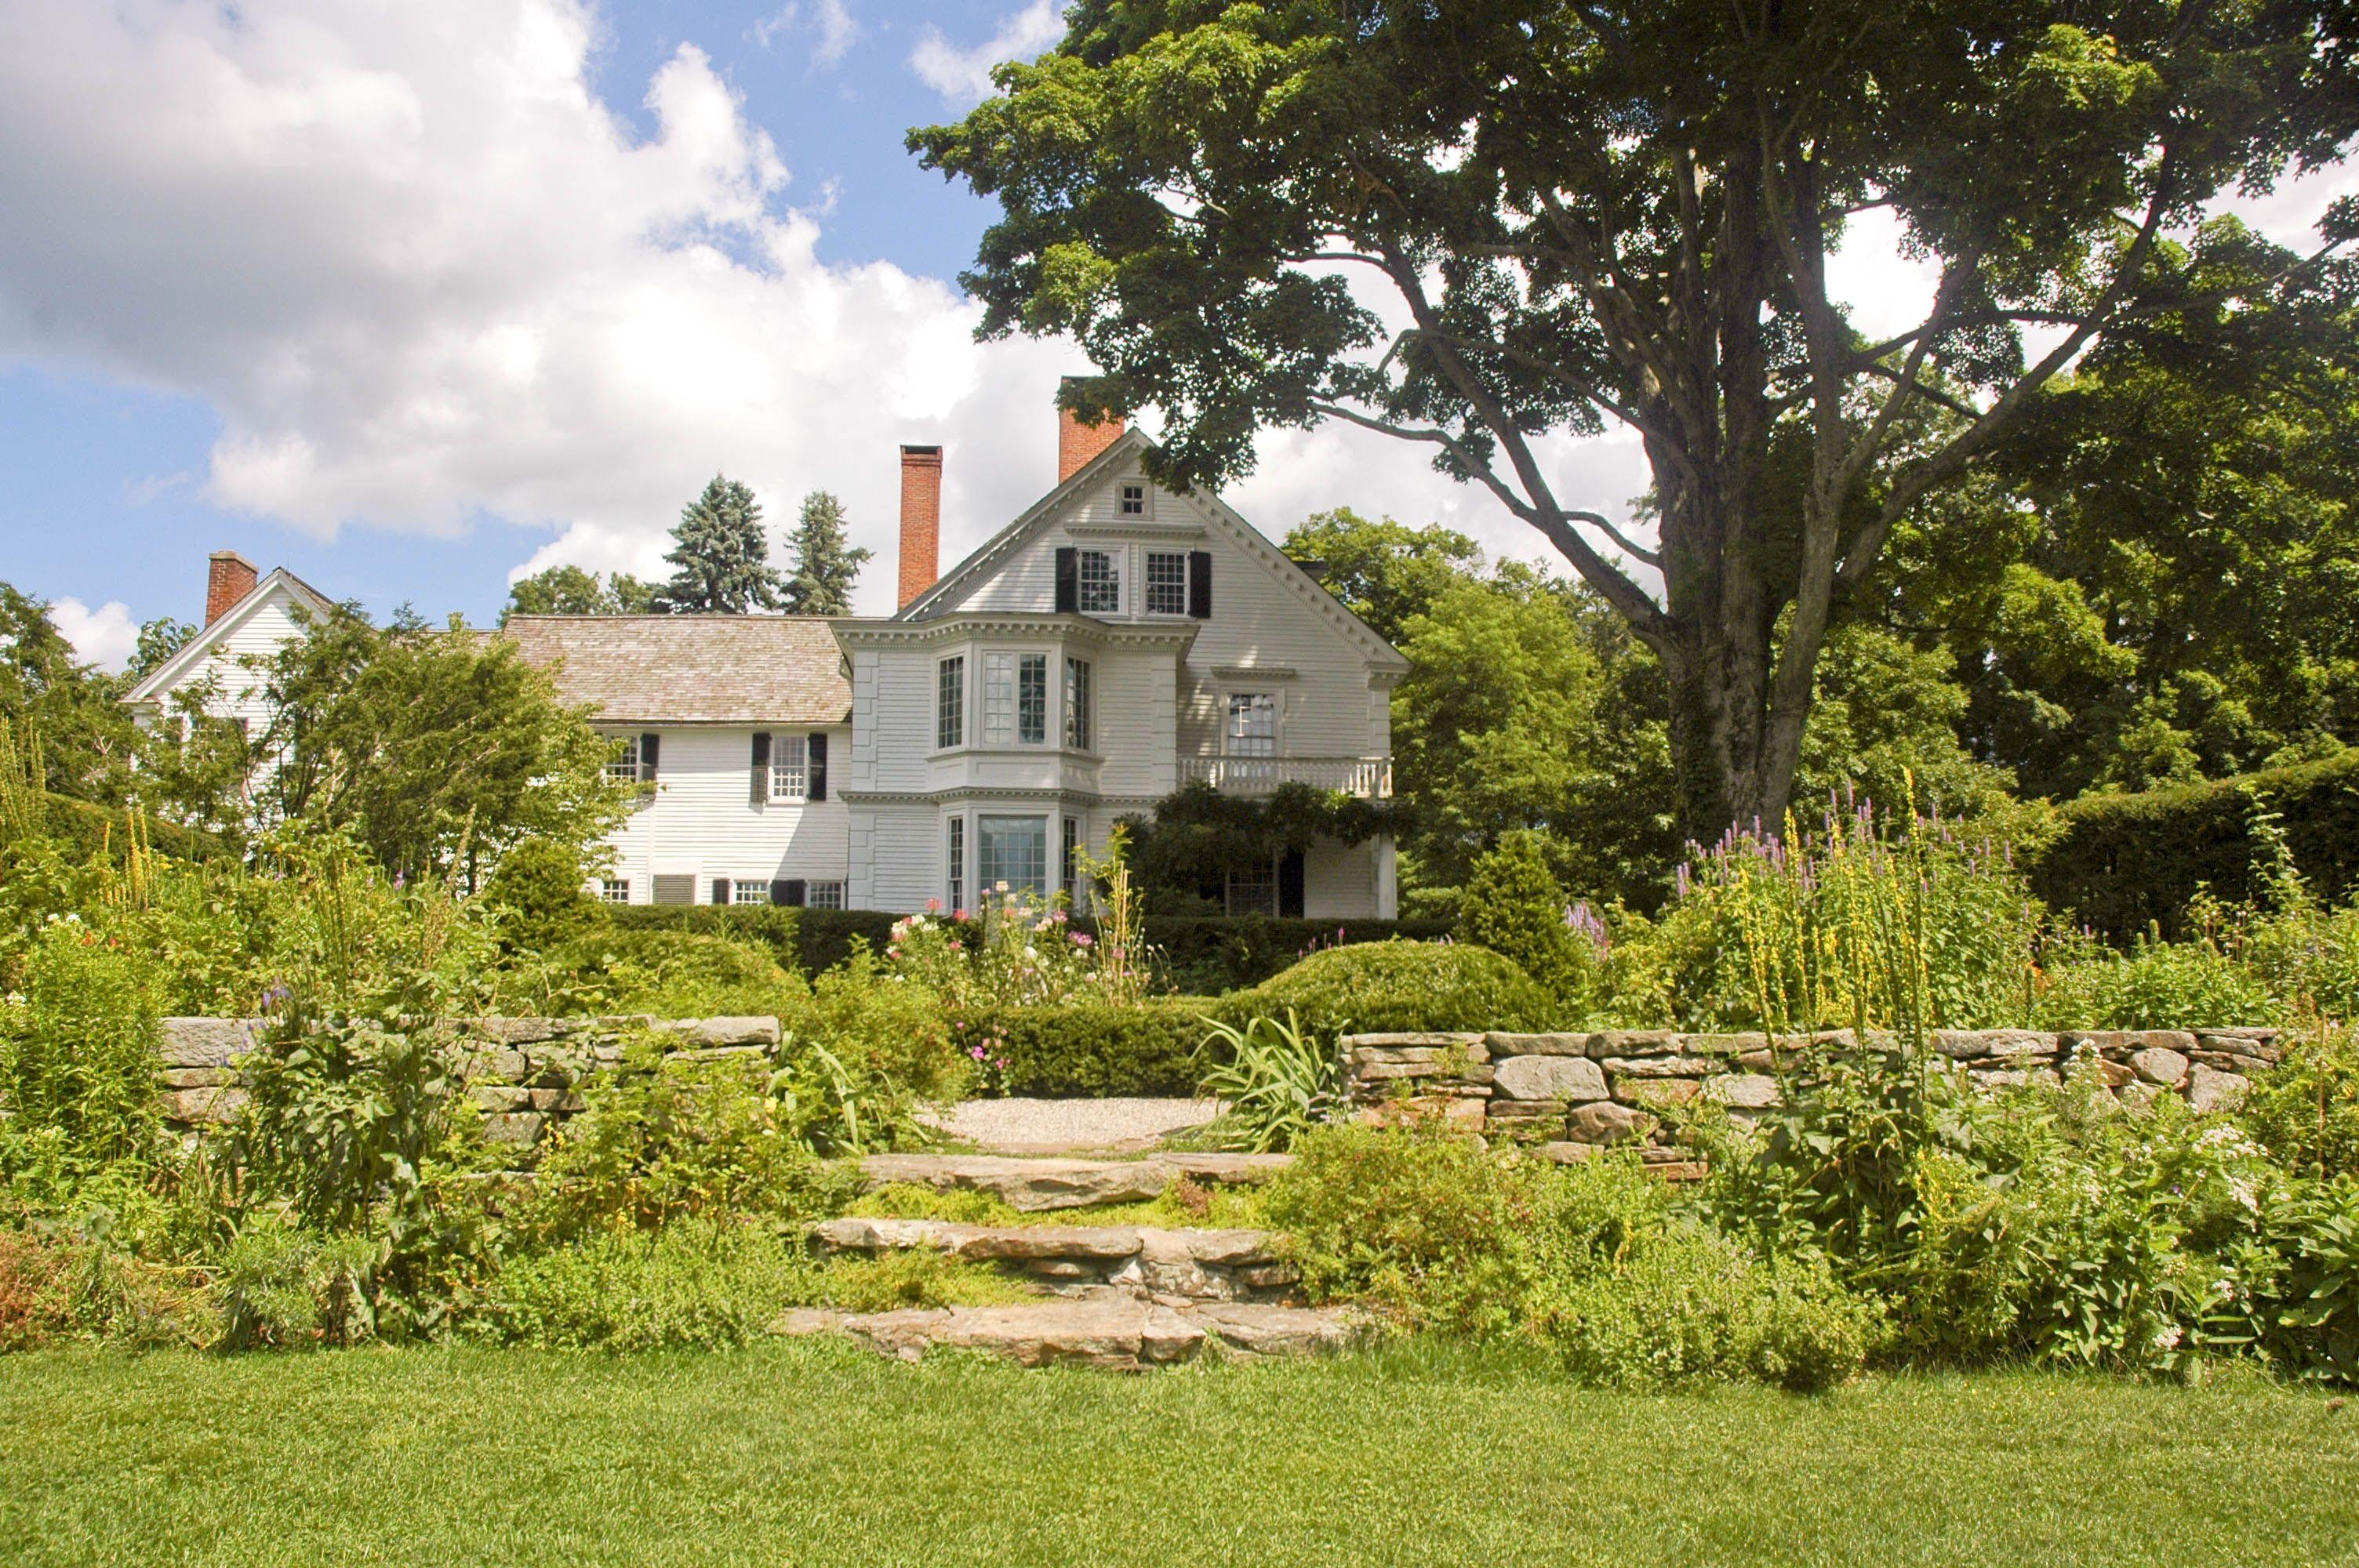 2ed4f715f7bc69983a95f9fd1a12b474 - Historic House And Gardens Near Me